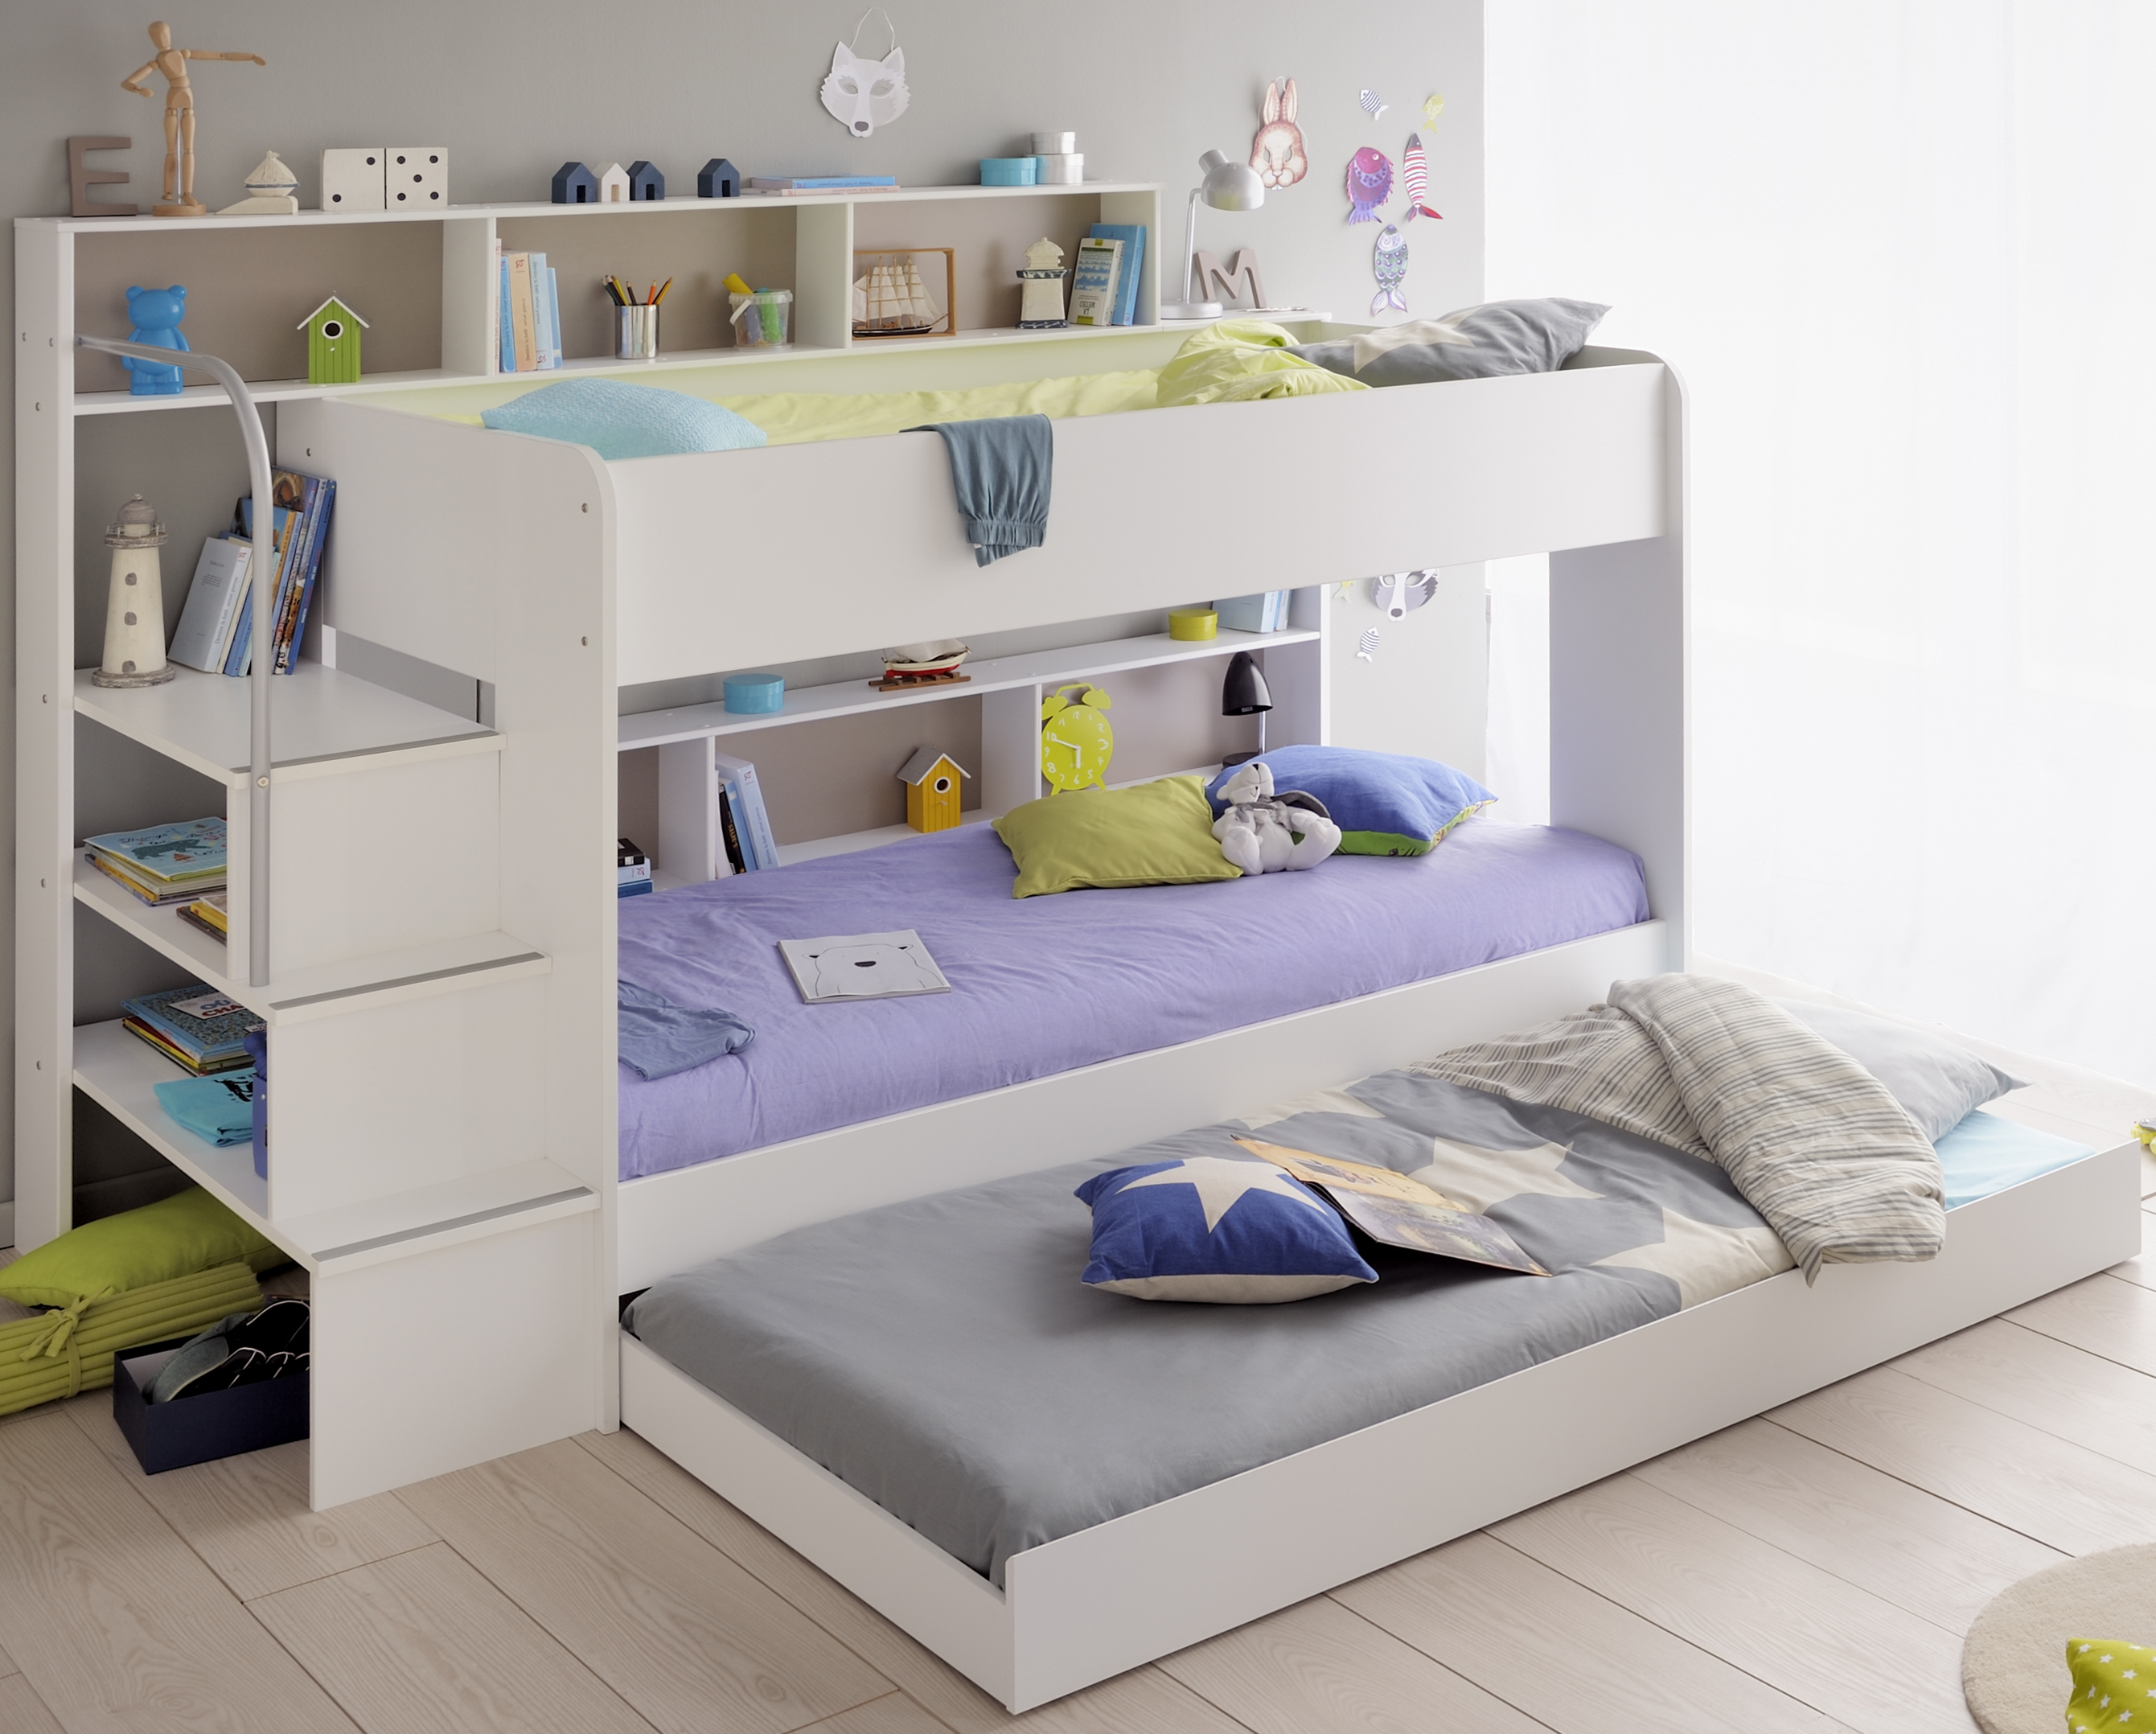 Kinderzimmer Mit Etagenbett : Kinderzimmer set tlg inkl etagenbett bettkasten u